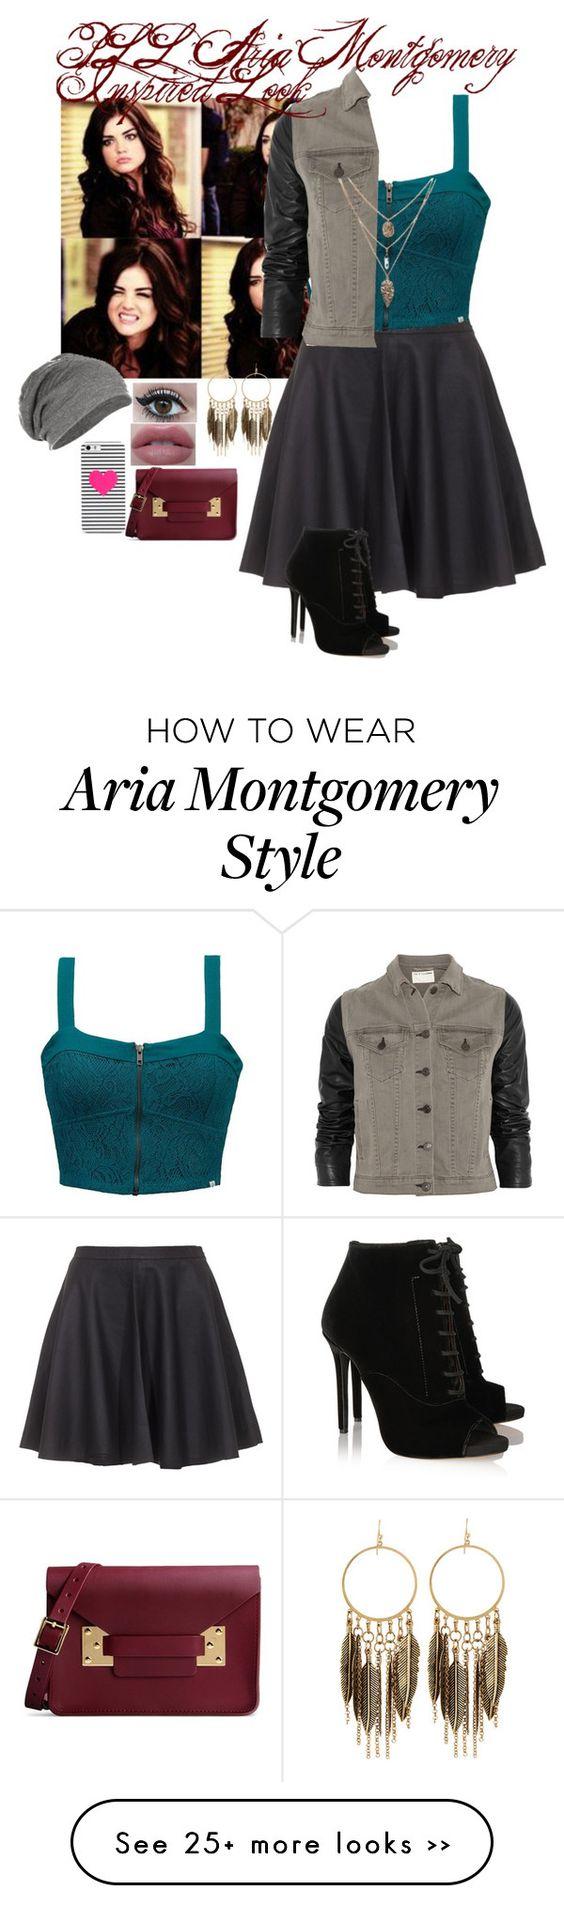 """PLL Aria Montgomery Inspired Look"" by pierangelisvalerio on Polyvore"